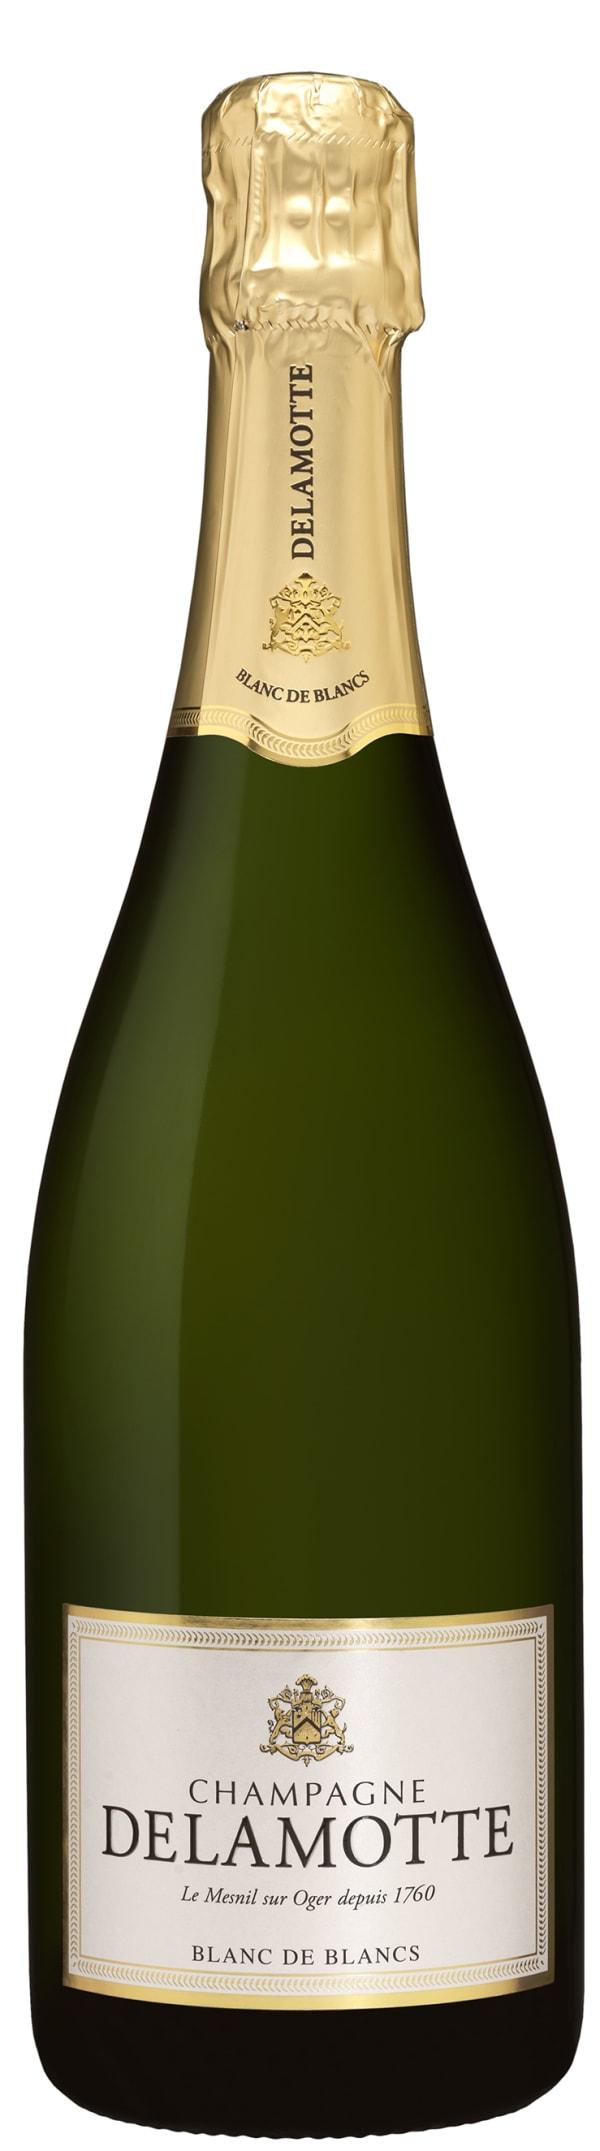 Delamotte Blanc de Blancs Champagne Brut